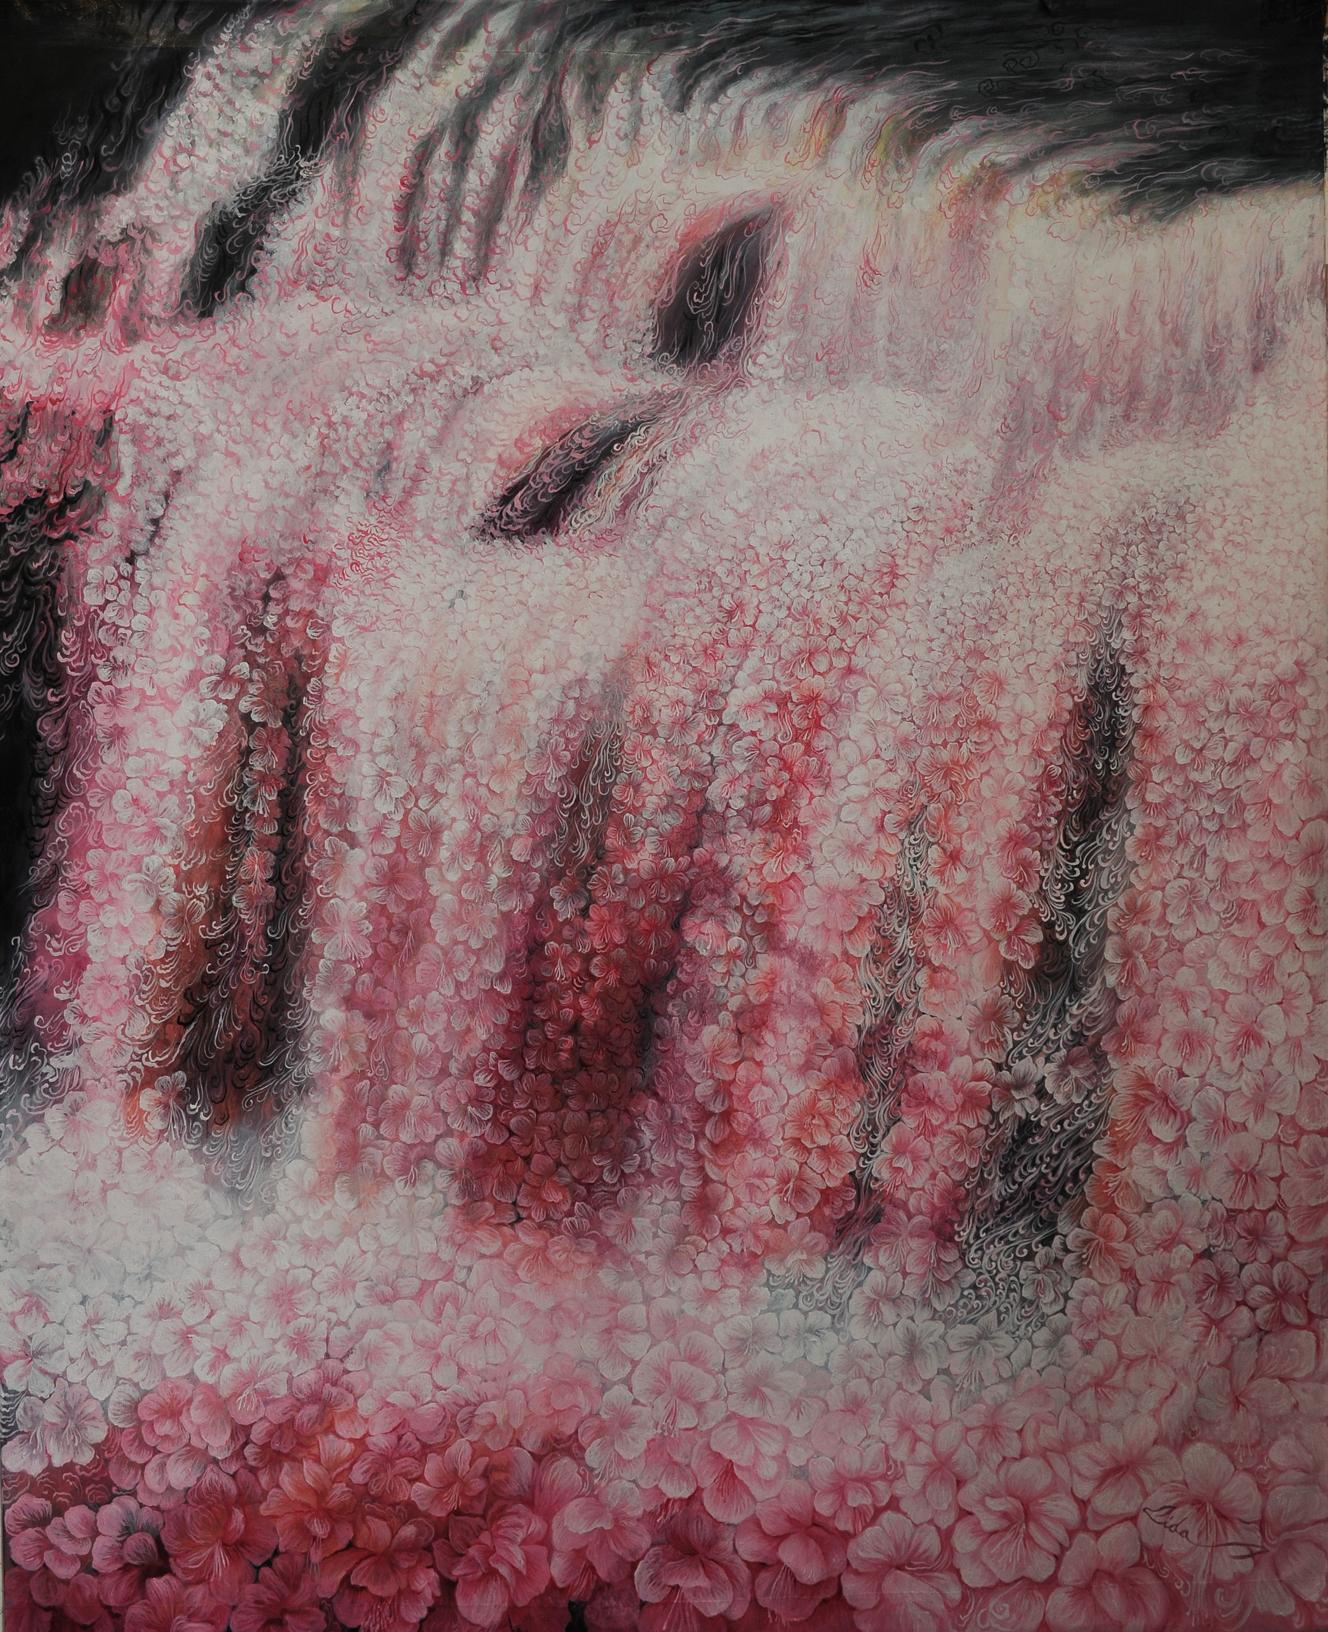 Lida sherafatmand, Waterfall of the Soul, oil on canvas,155 x 122 cm, 2016-s.jpg